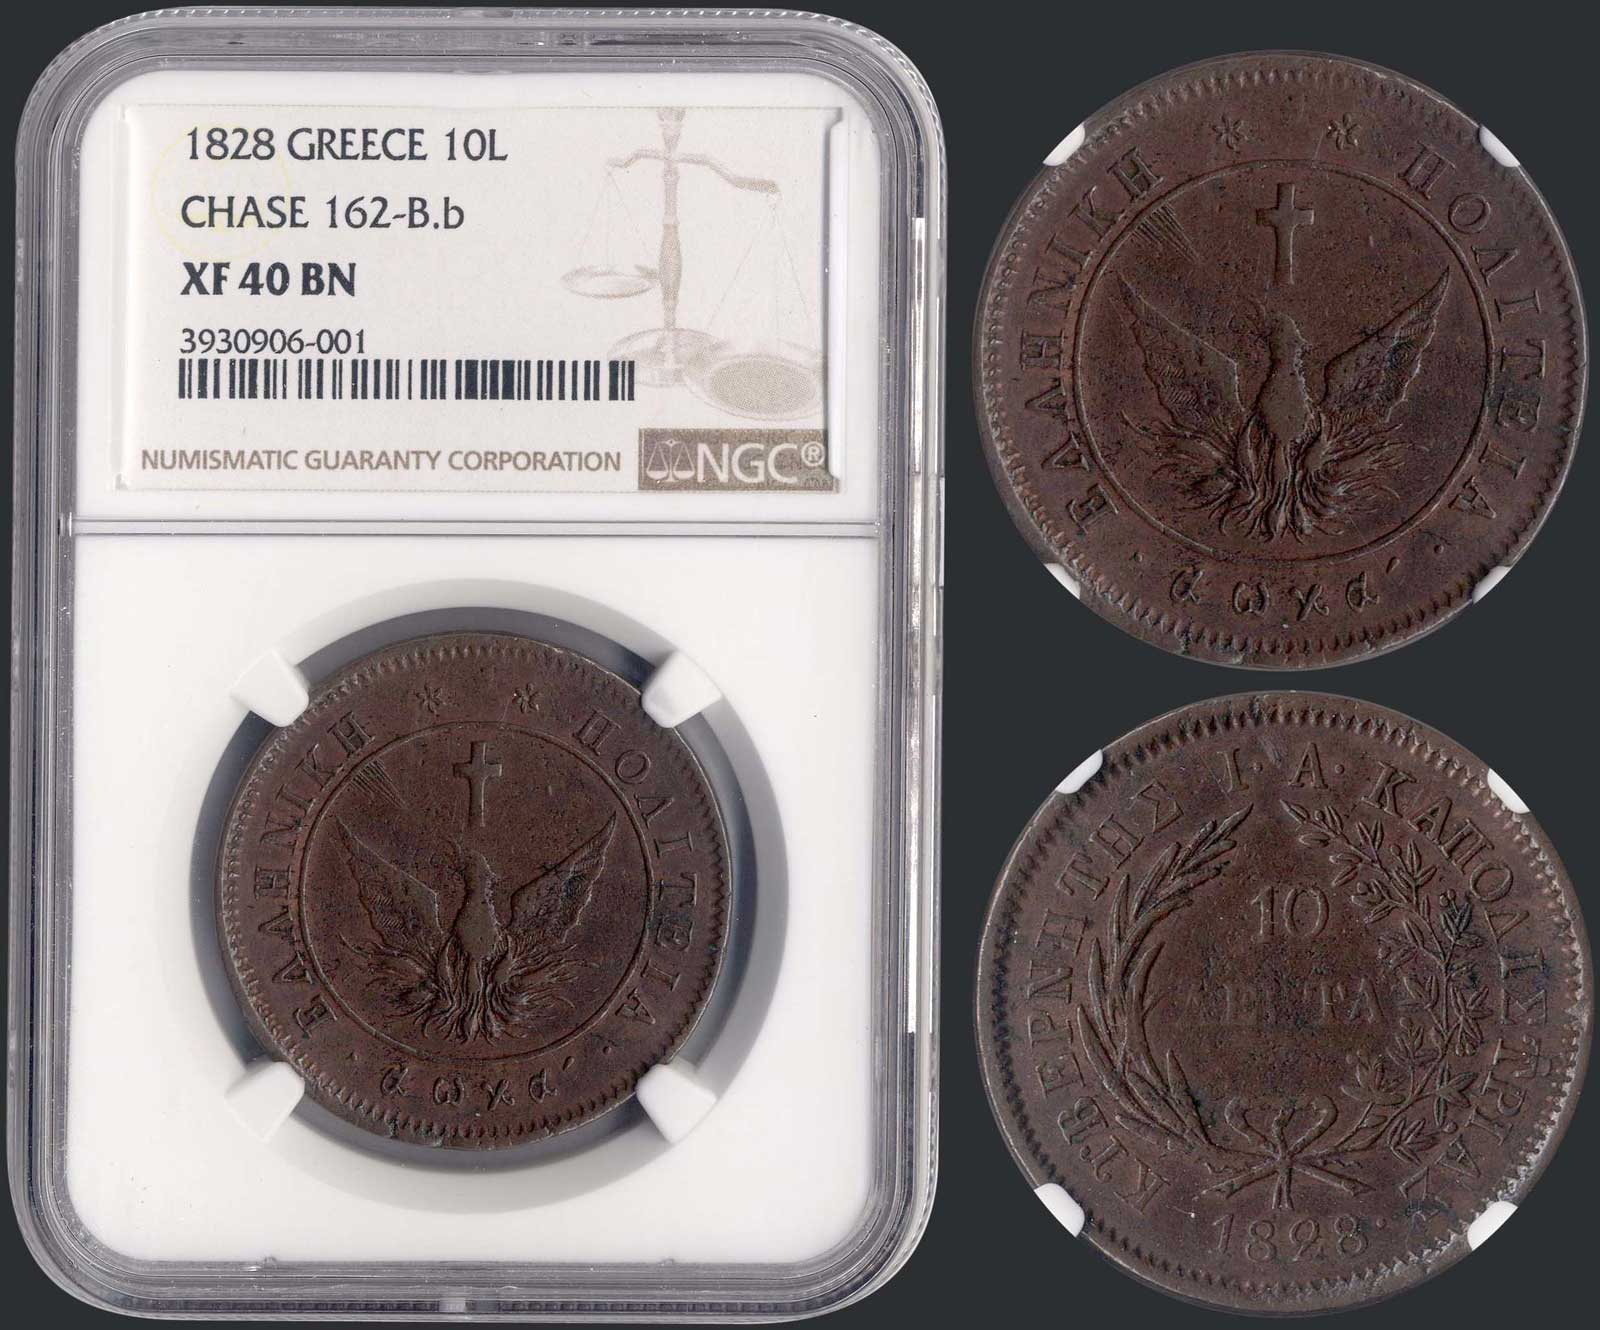 Lot 9007 - GREECE-  COINS & TOKENS governor capodistrias -  A. Karamitsos Public & LIVE Bid Auction 606 Coins, Medals & Banknotes